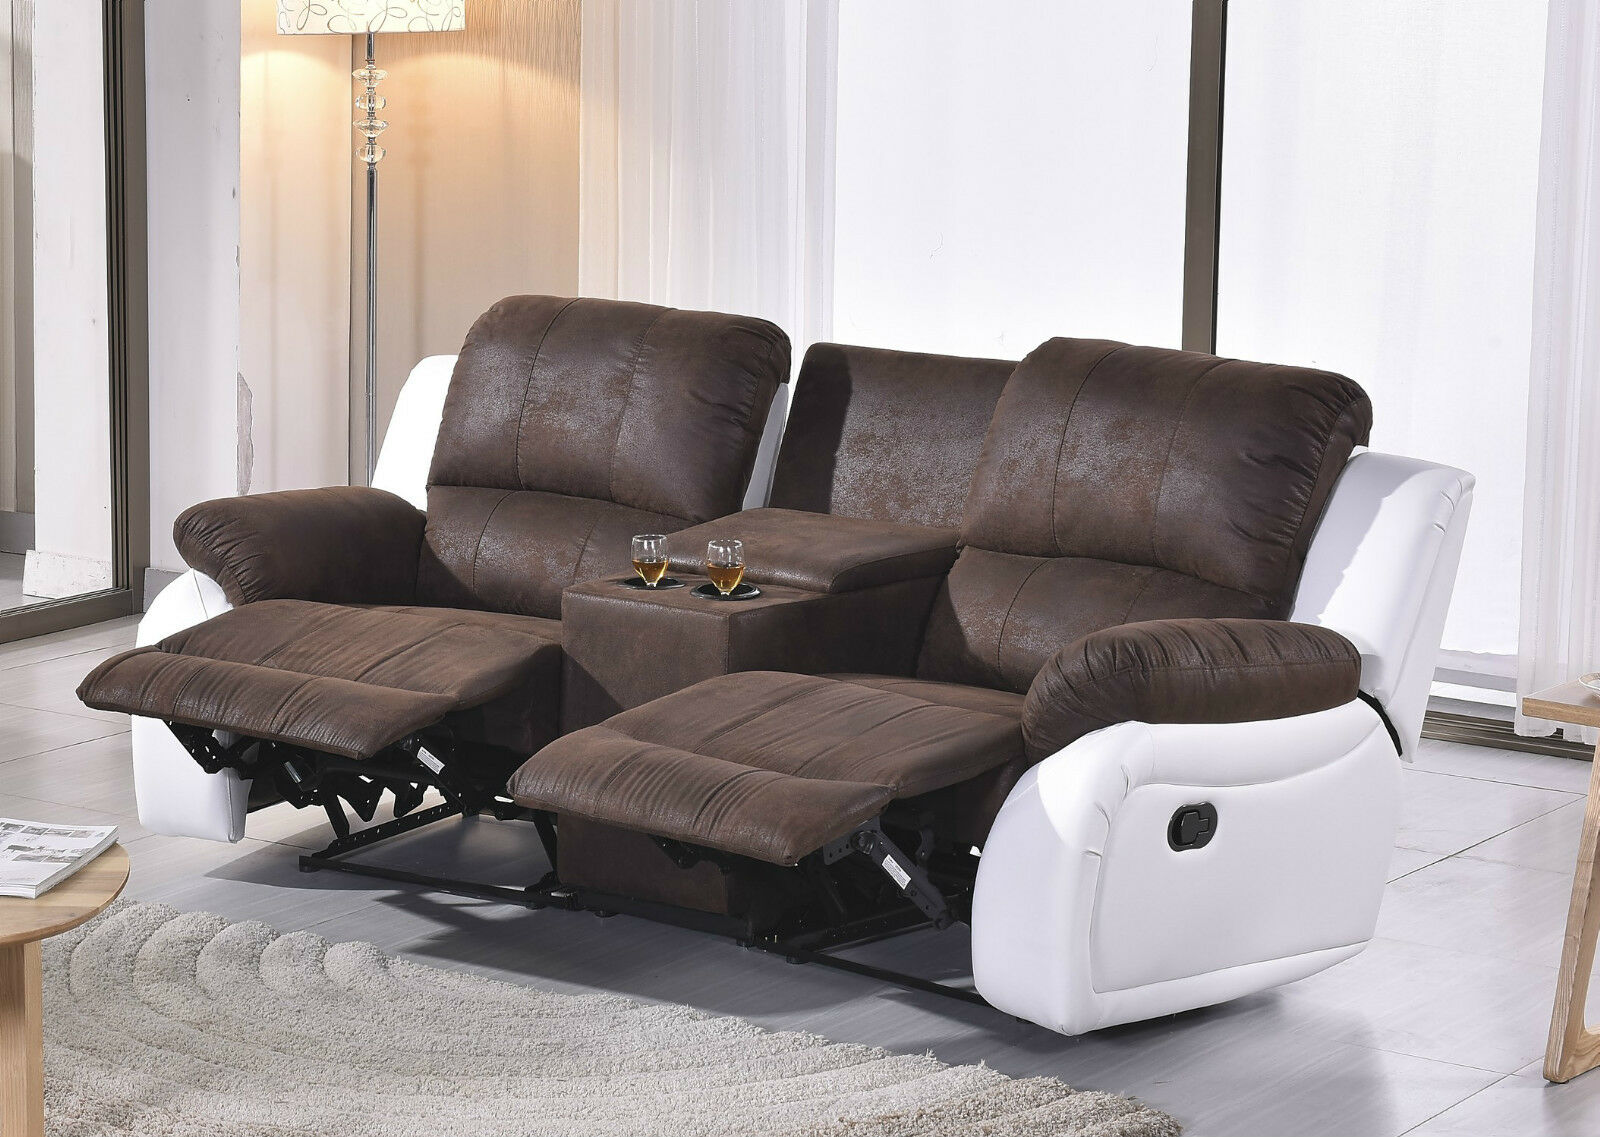 mikrofaser sofa kinosofa relaxcouch fernsehsofa recliner. Black Bedroom Furniture Sets. Home Design Ideas